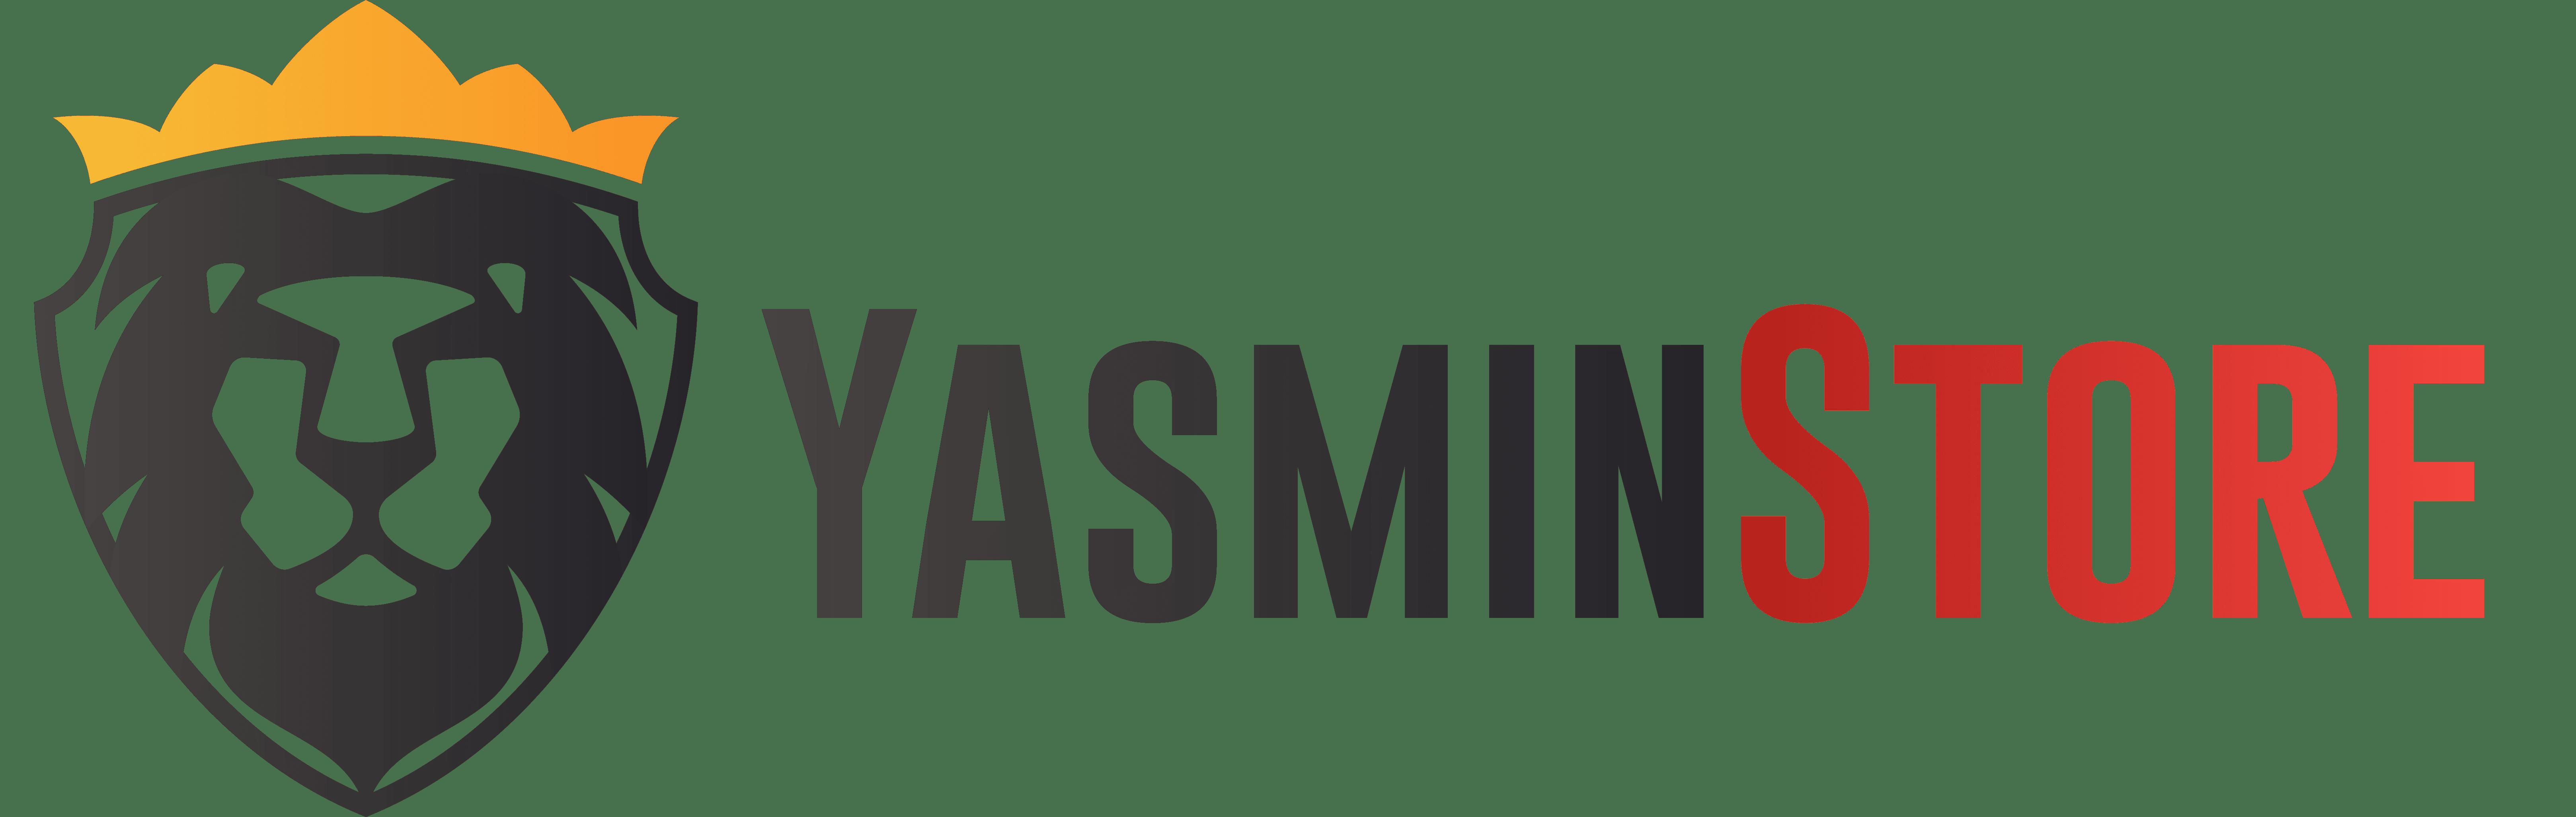 3f89431969b relogio - Yasmin Store